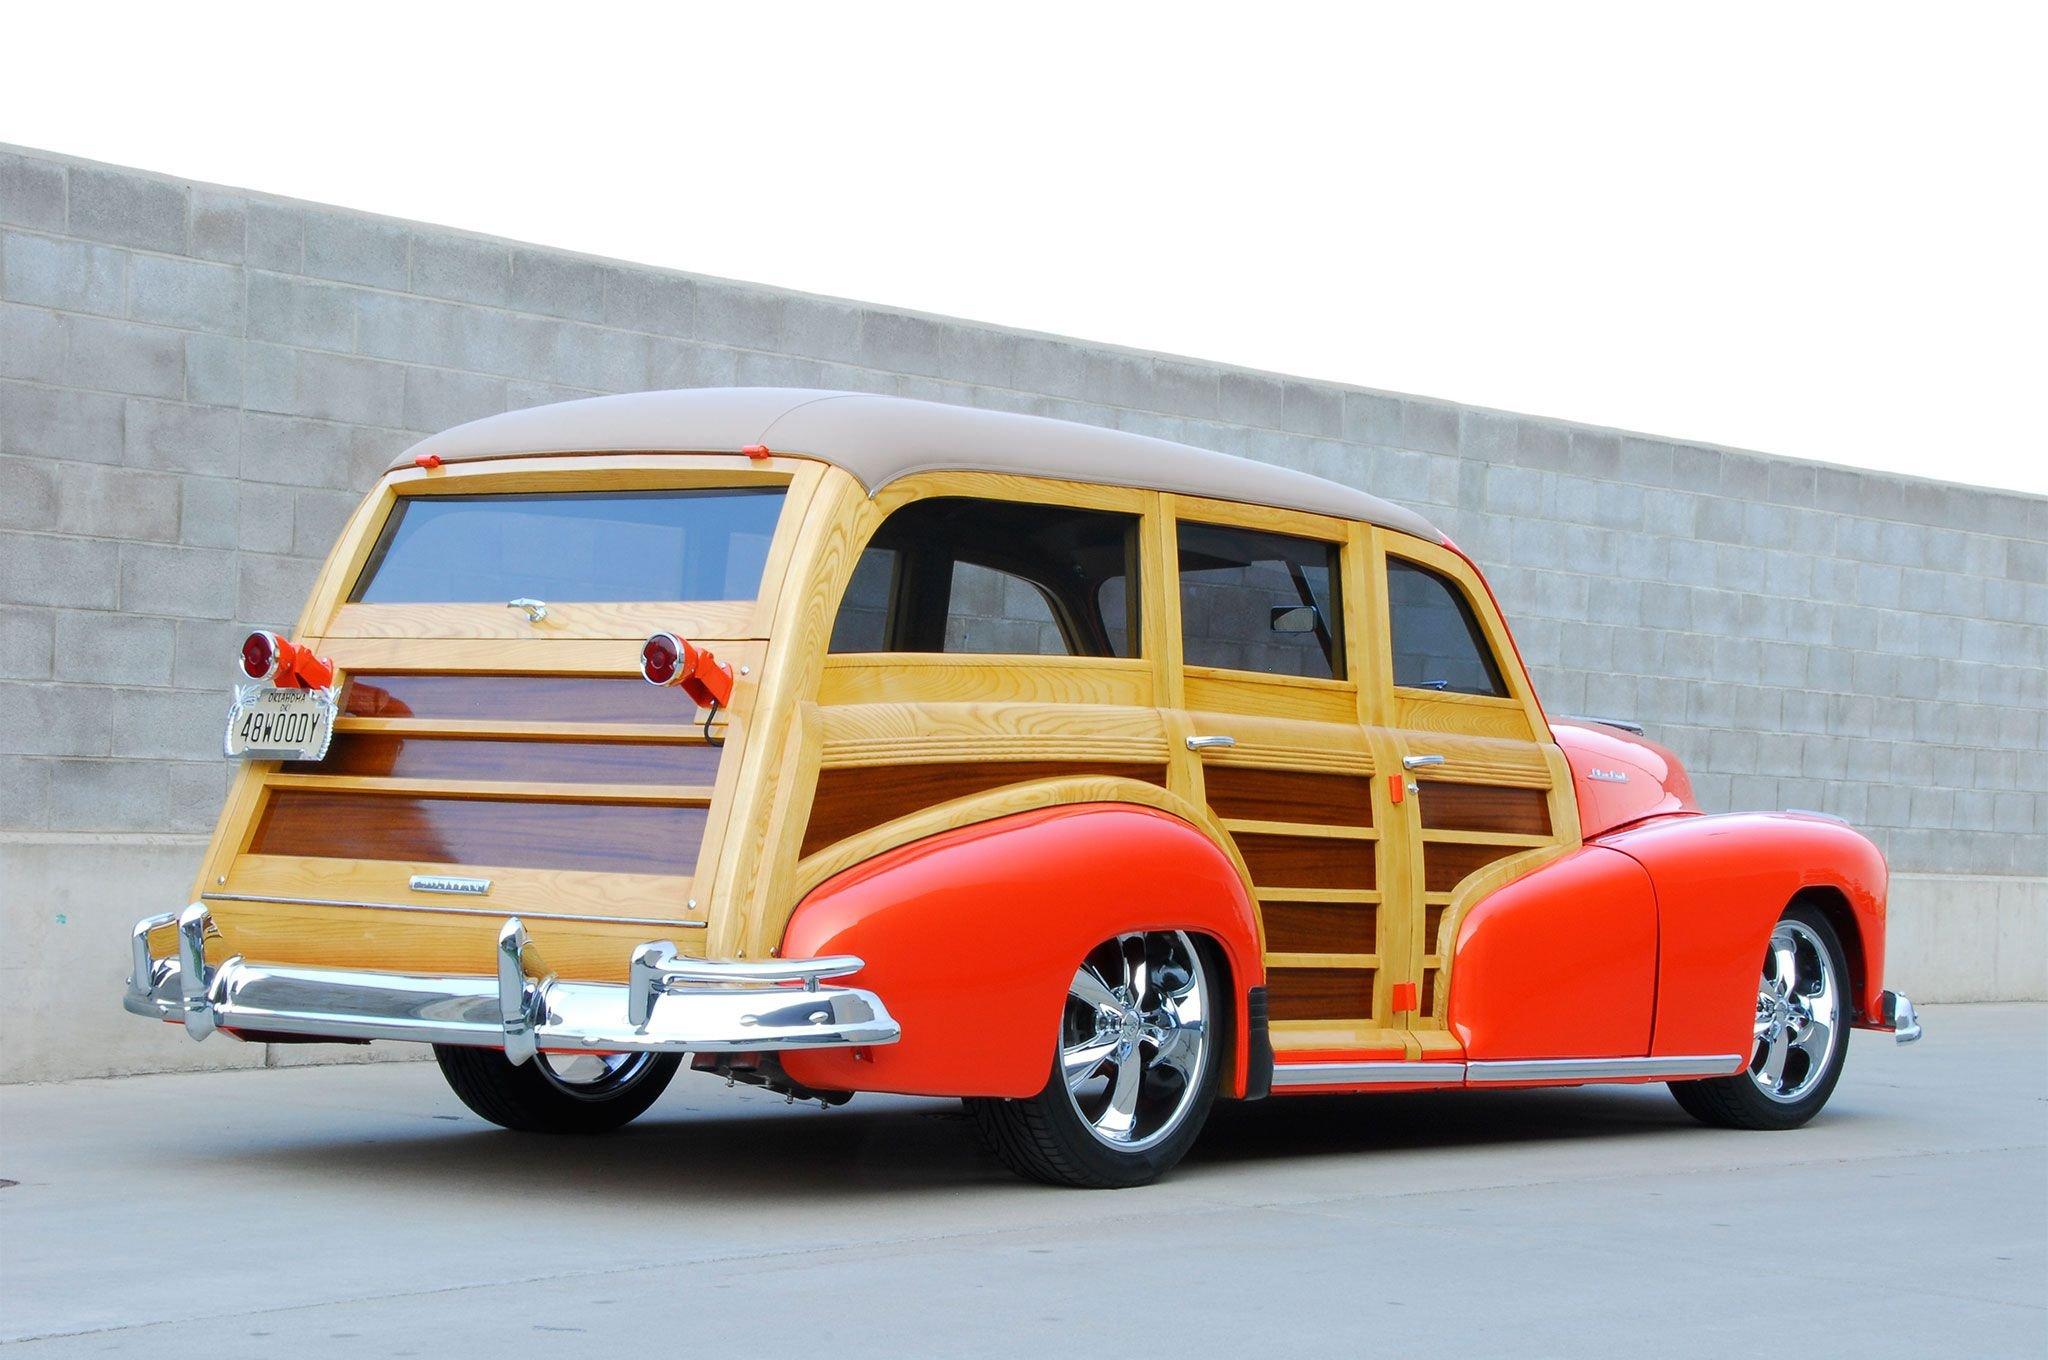 1948 Pontiac Streamliner Deluxe Woodie-02 wallpaper